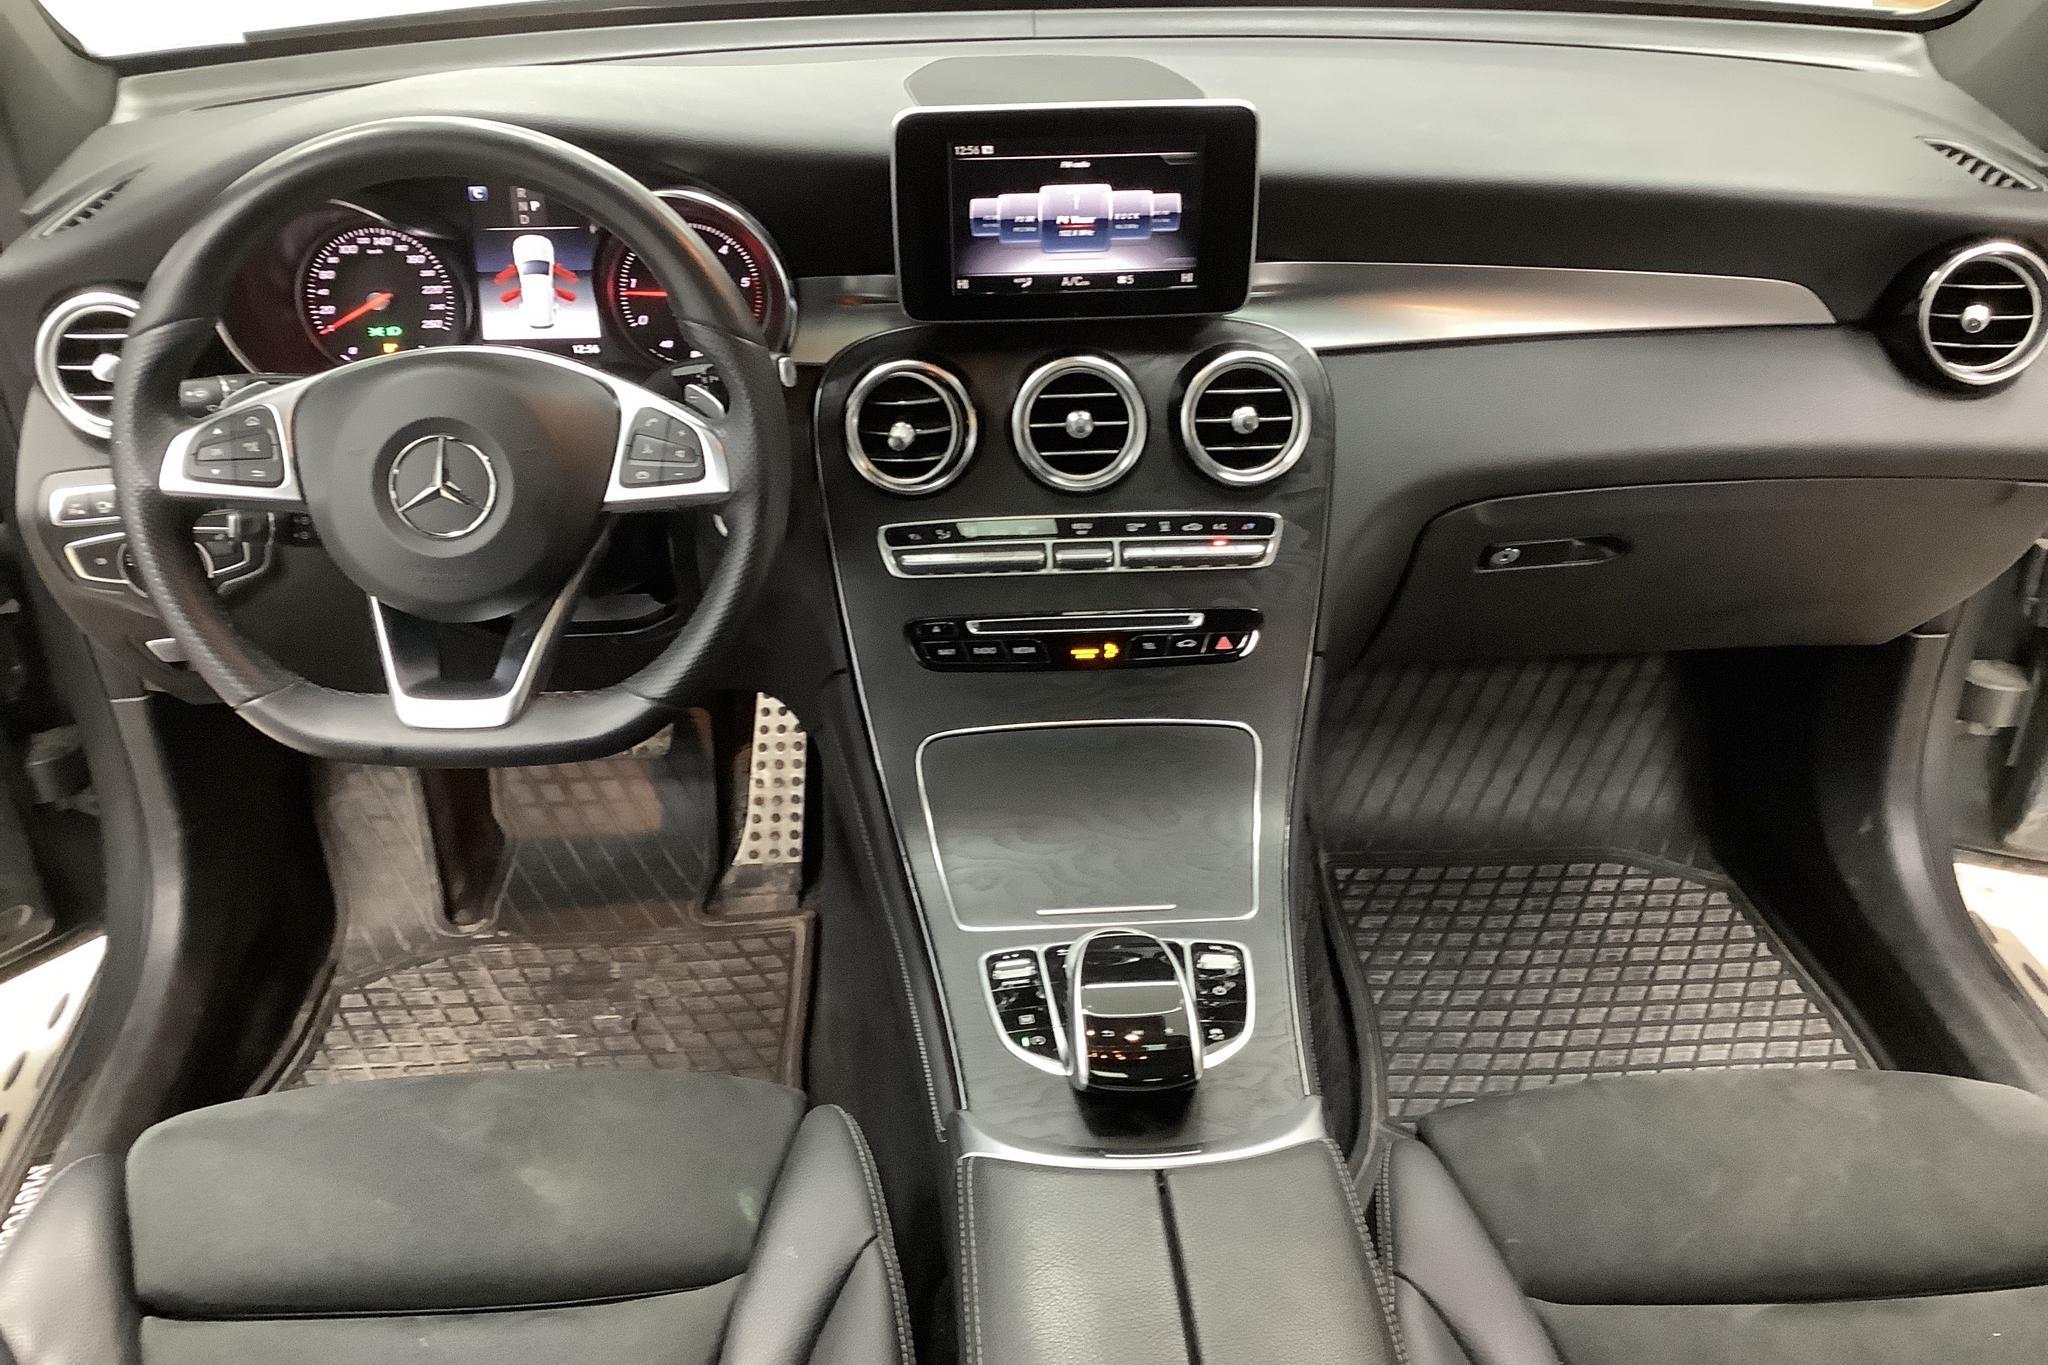 Mercedes GLC 220 d 4MATIC X253 (170hk) - 49 010 km - Automatic - gray - 2018